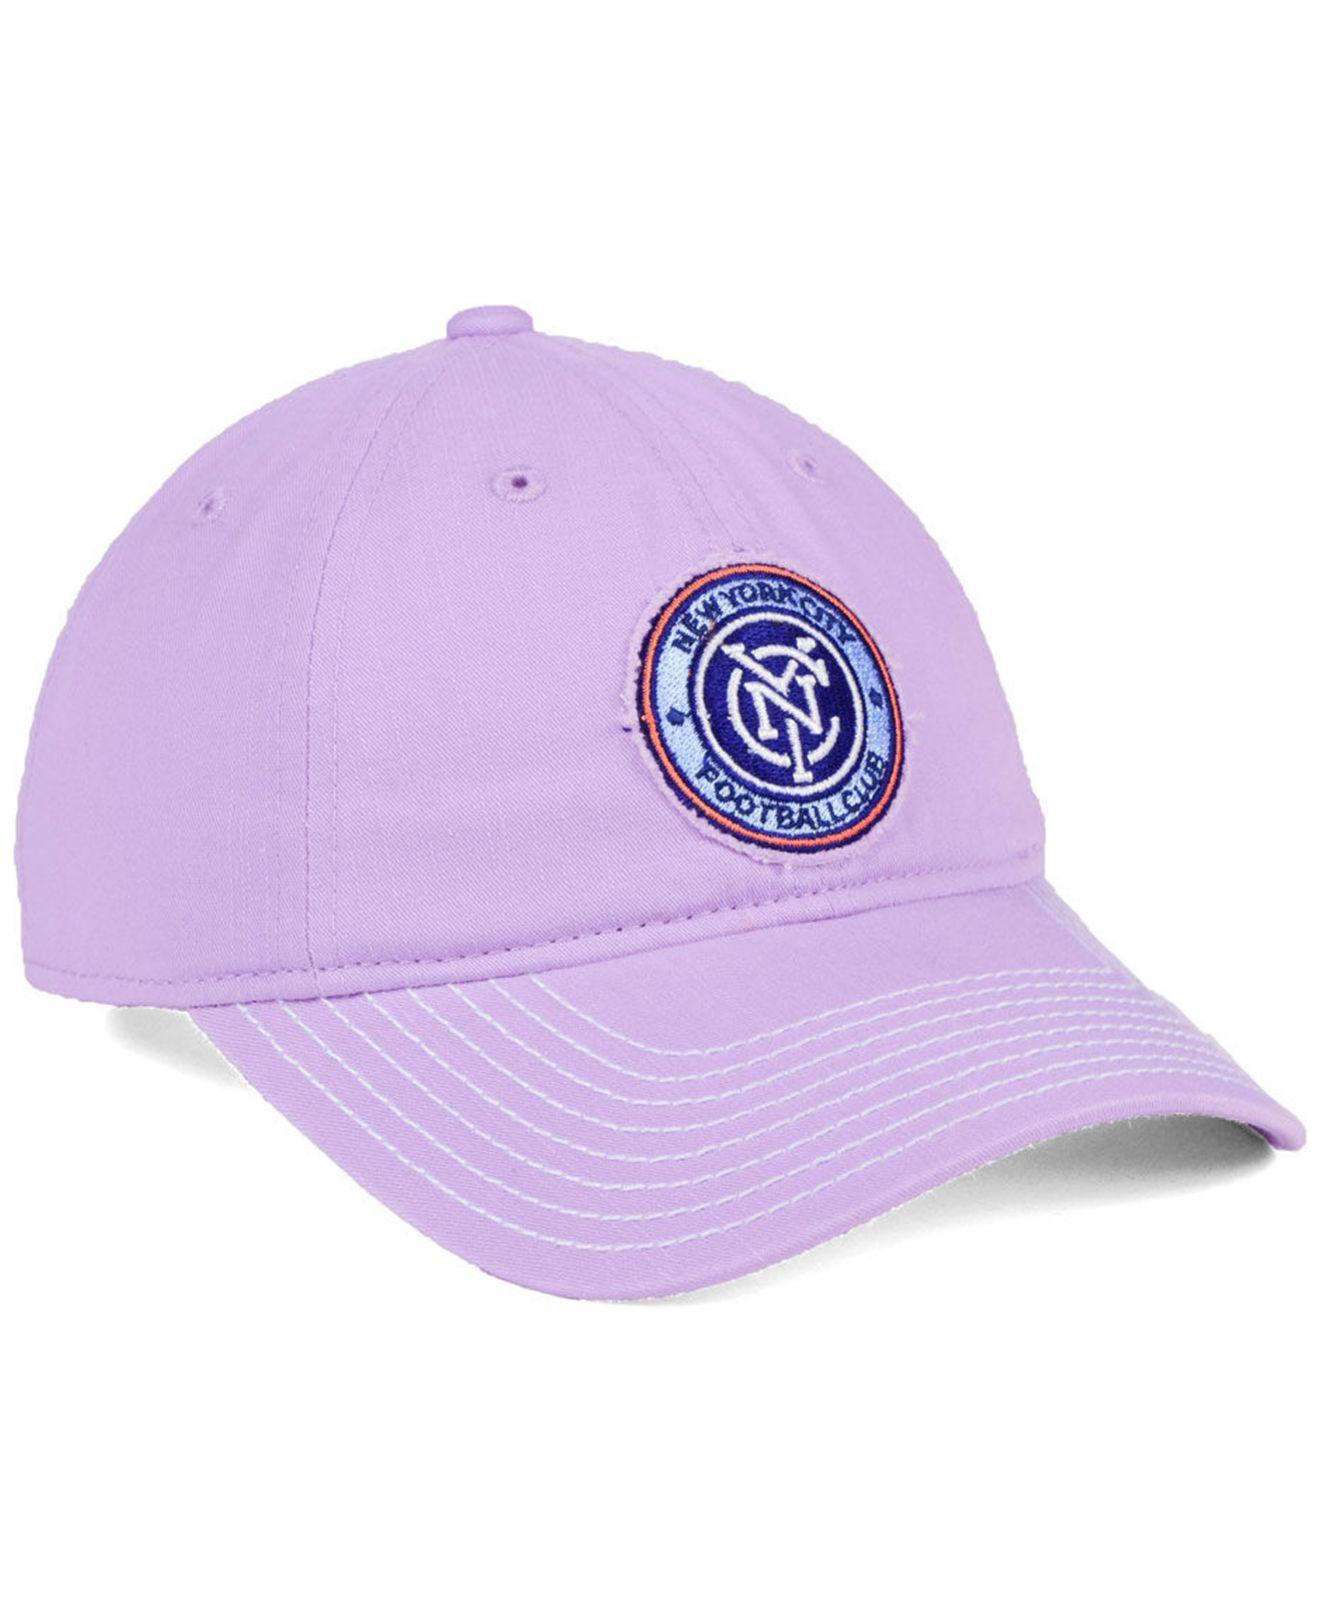 194c4d8881a4c coupon adidas purple new york city fc pink slouch cap lyst. view fullscreen  489e8 496b1